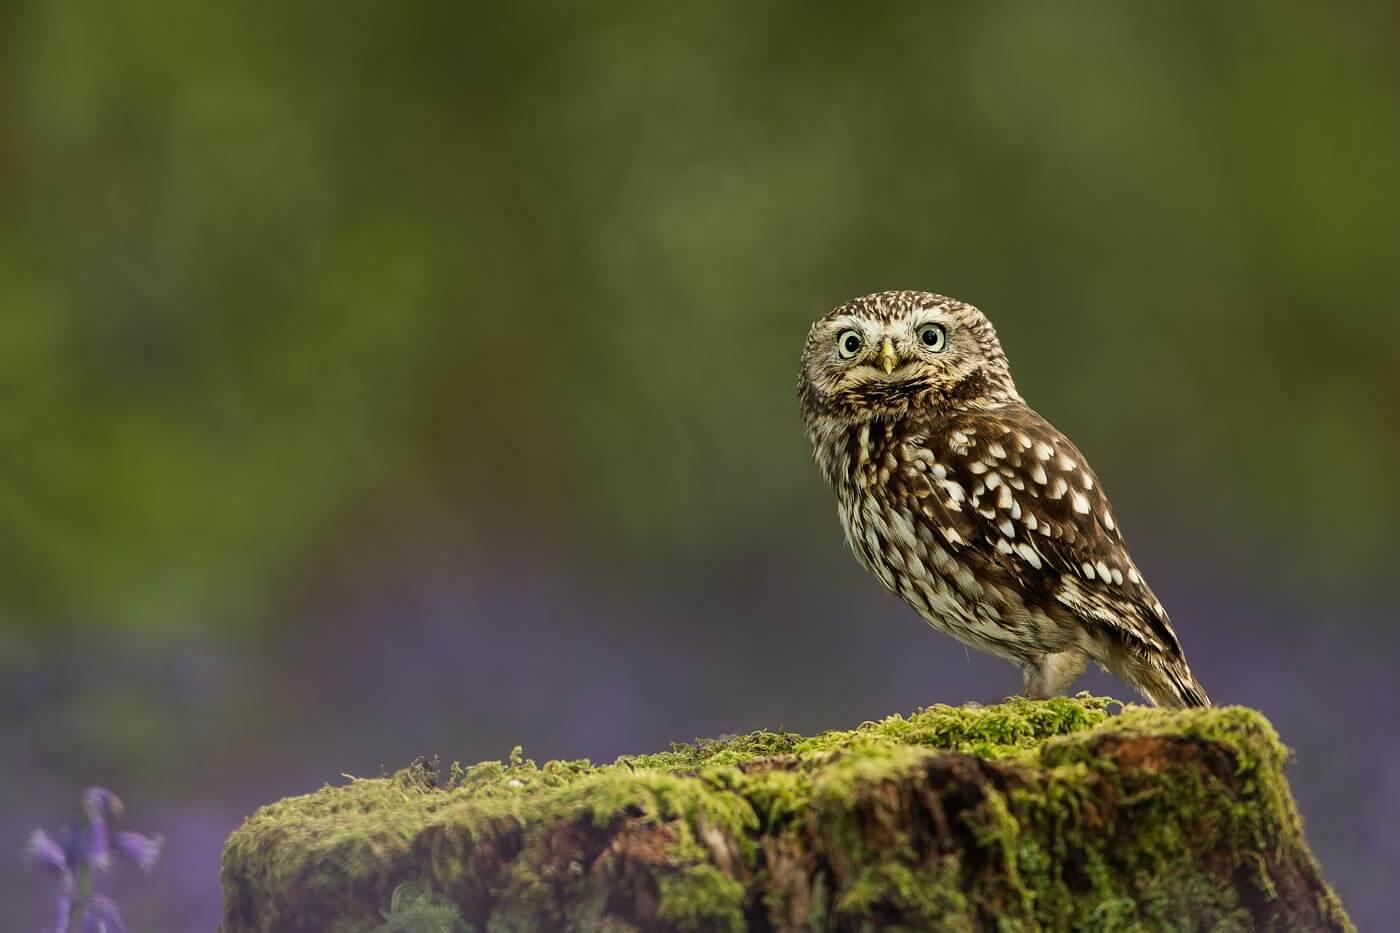 PWP_035_Little_Owl_PWP_024_Little_Owl_AH0R7898A